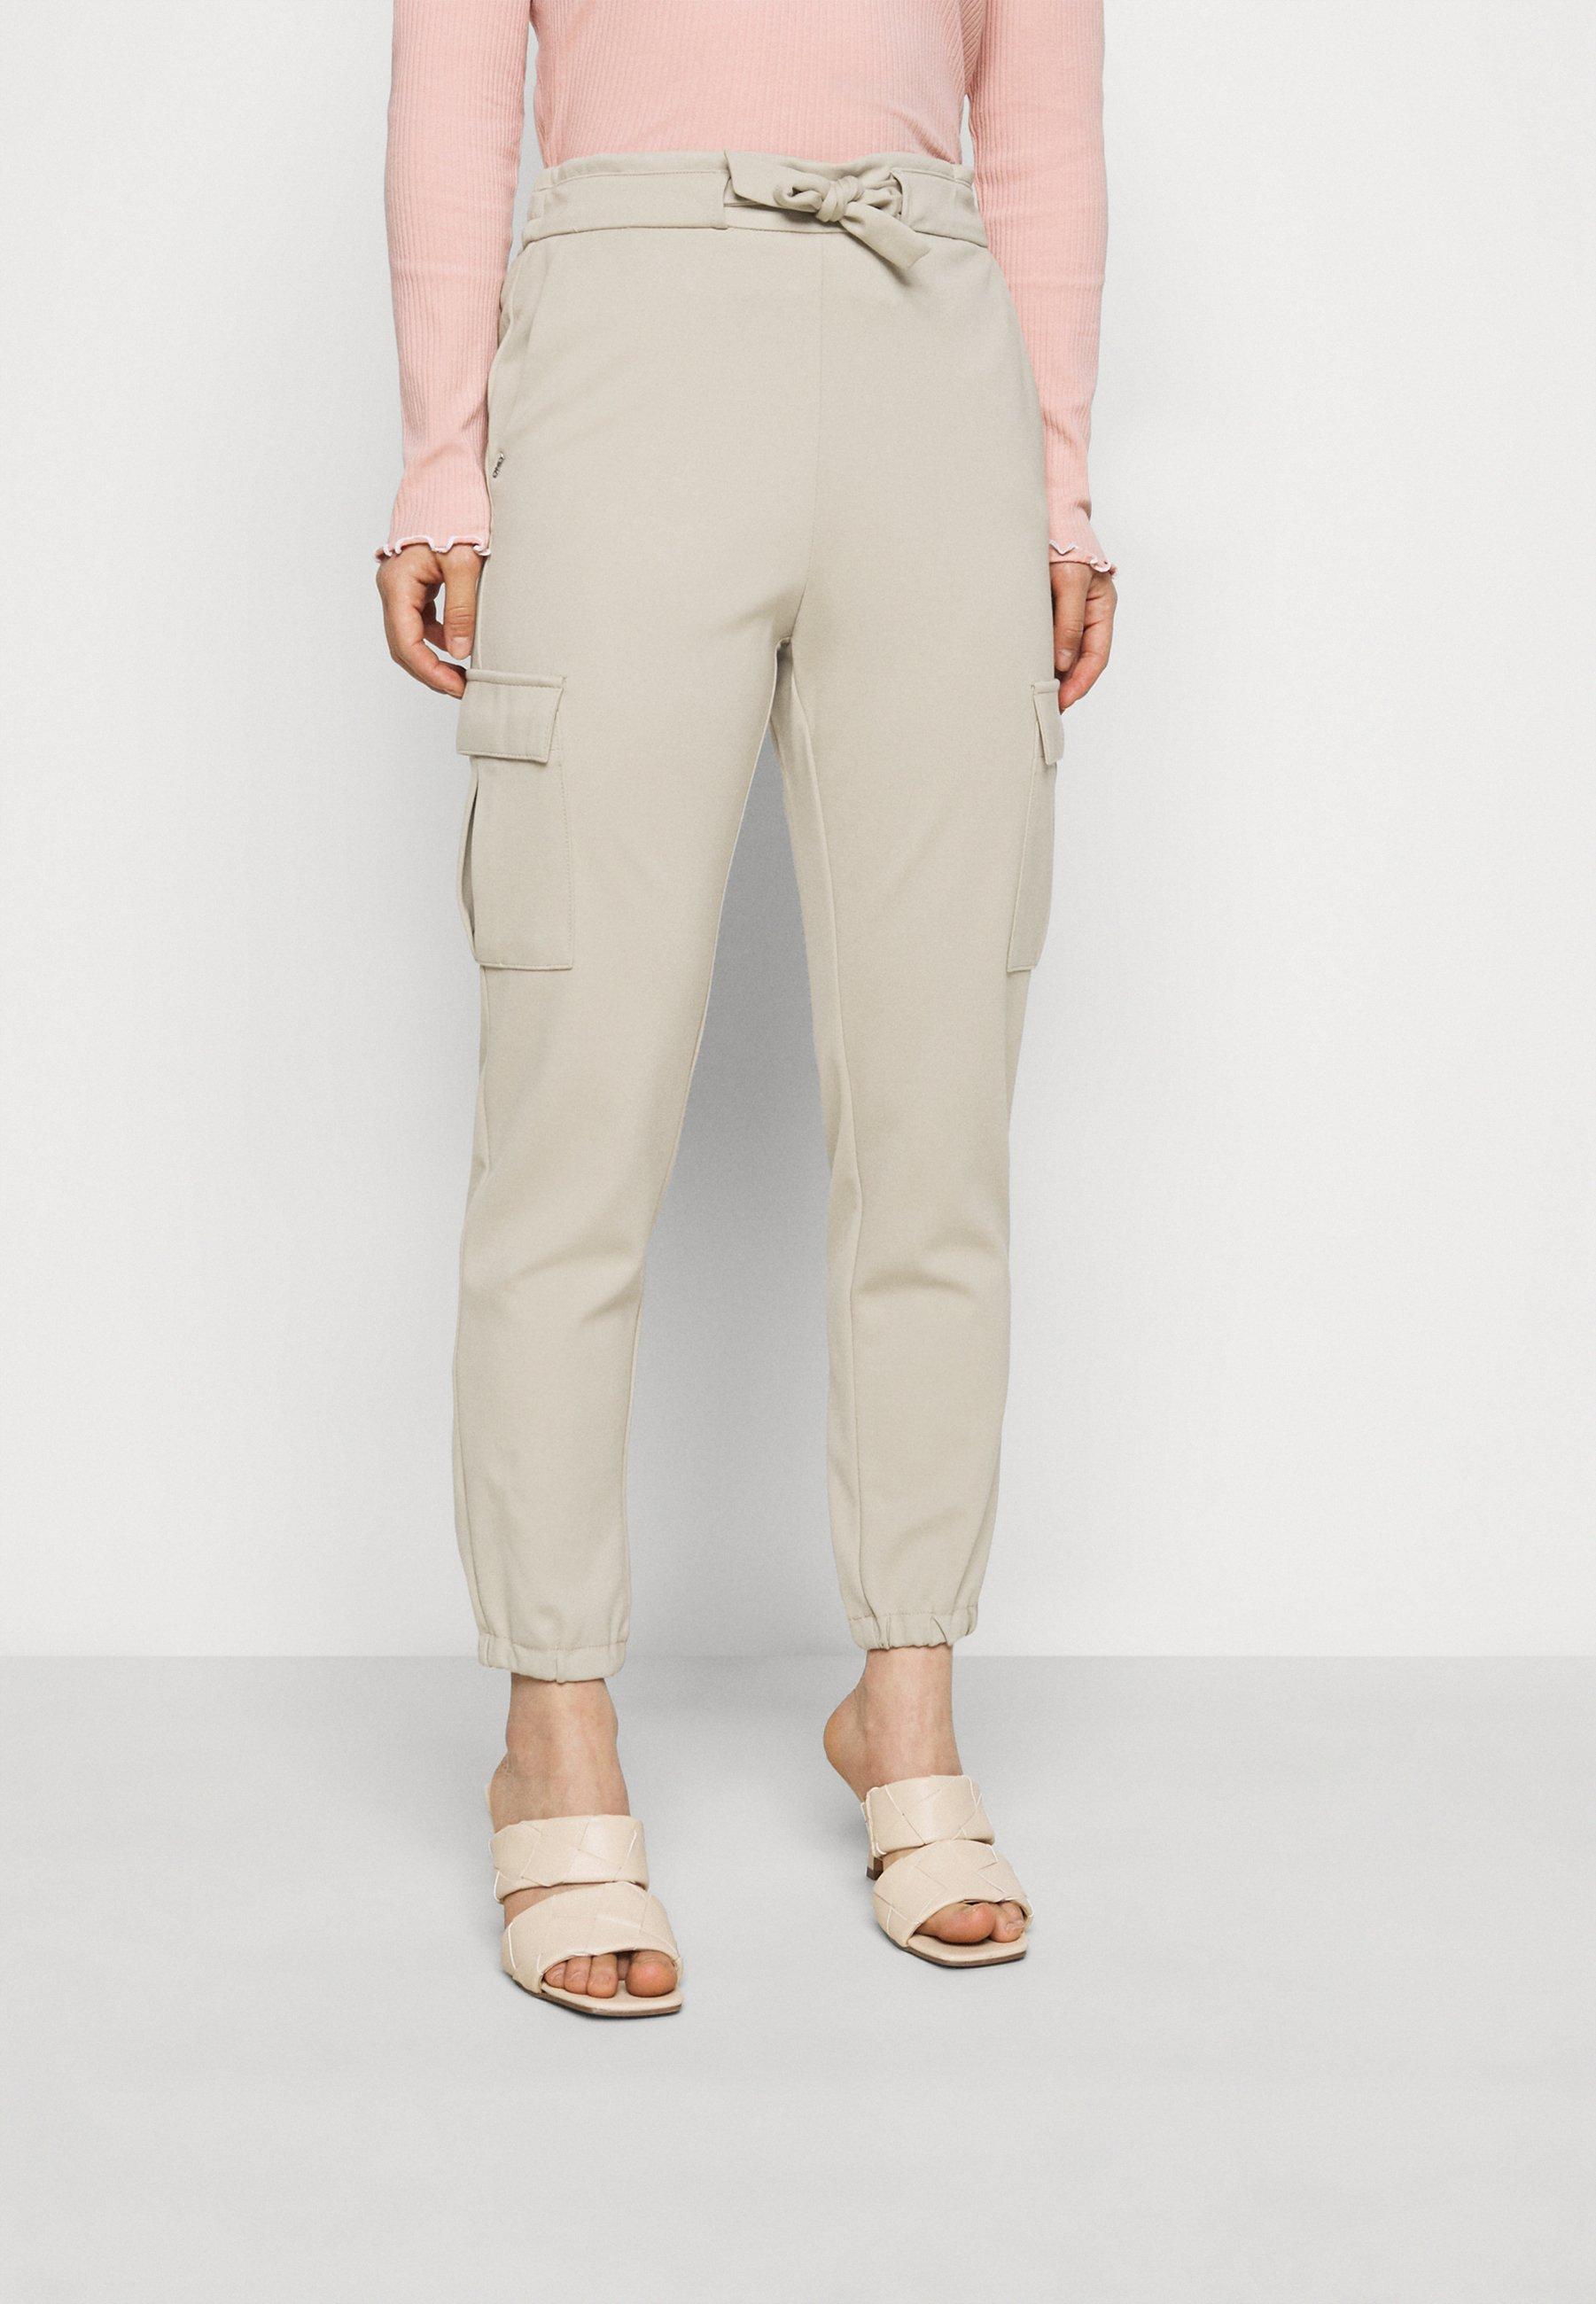 Femme ONLPOPTRASH BELT PANT - Pantalon cargo